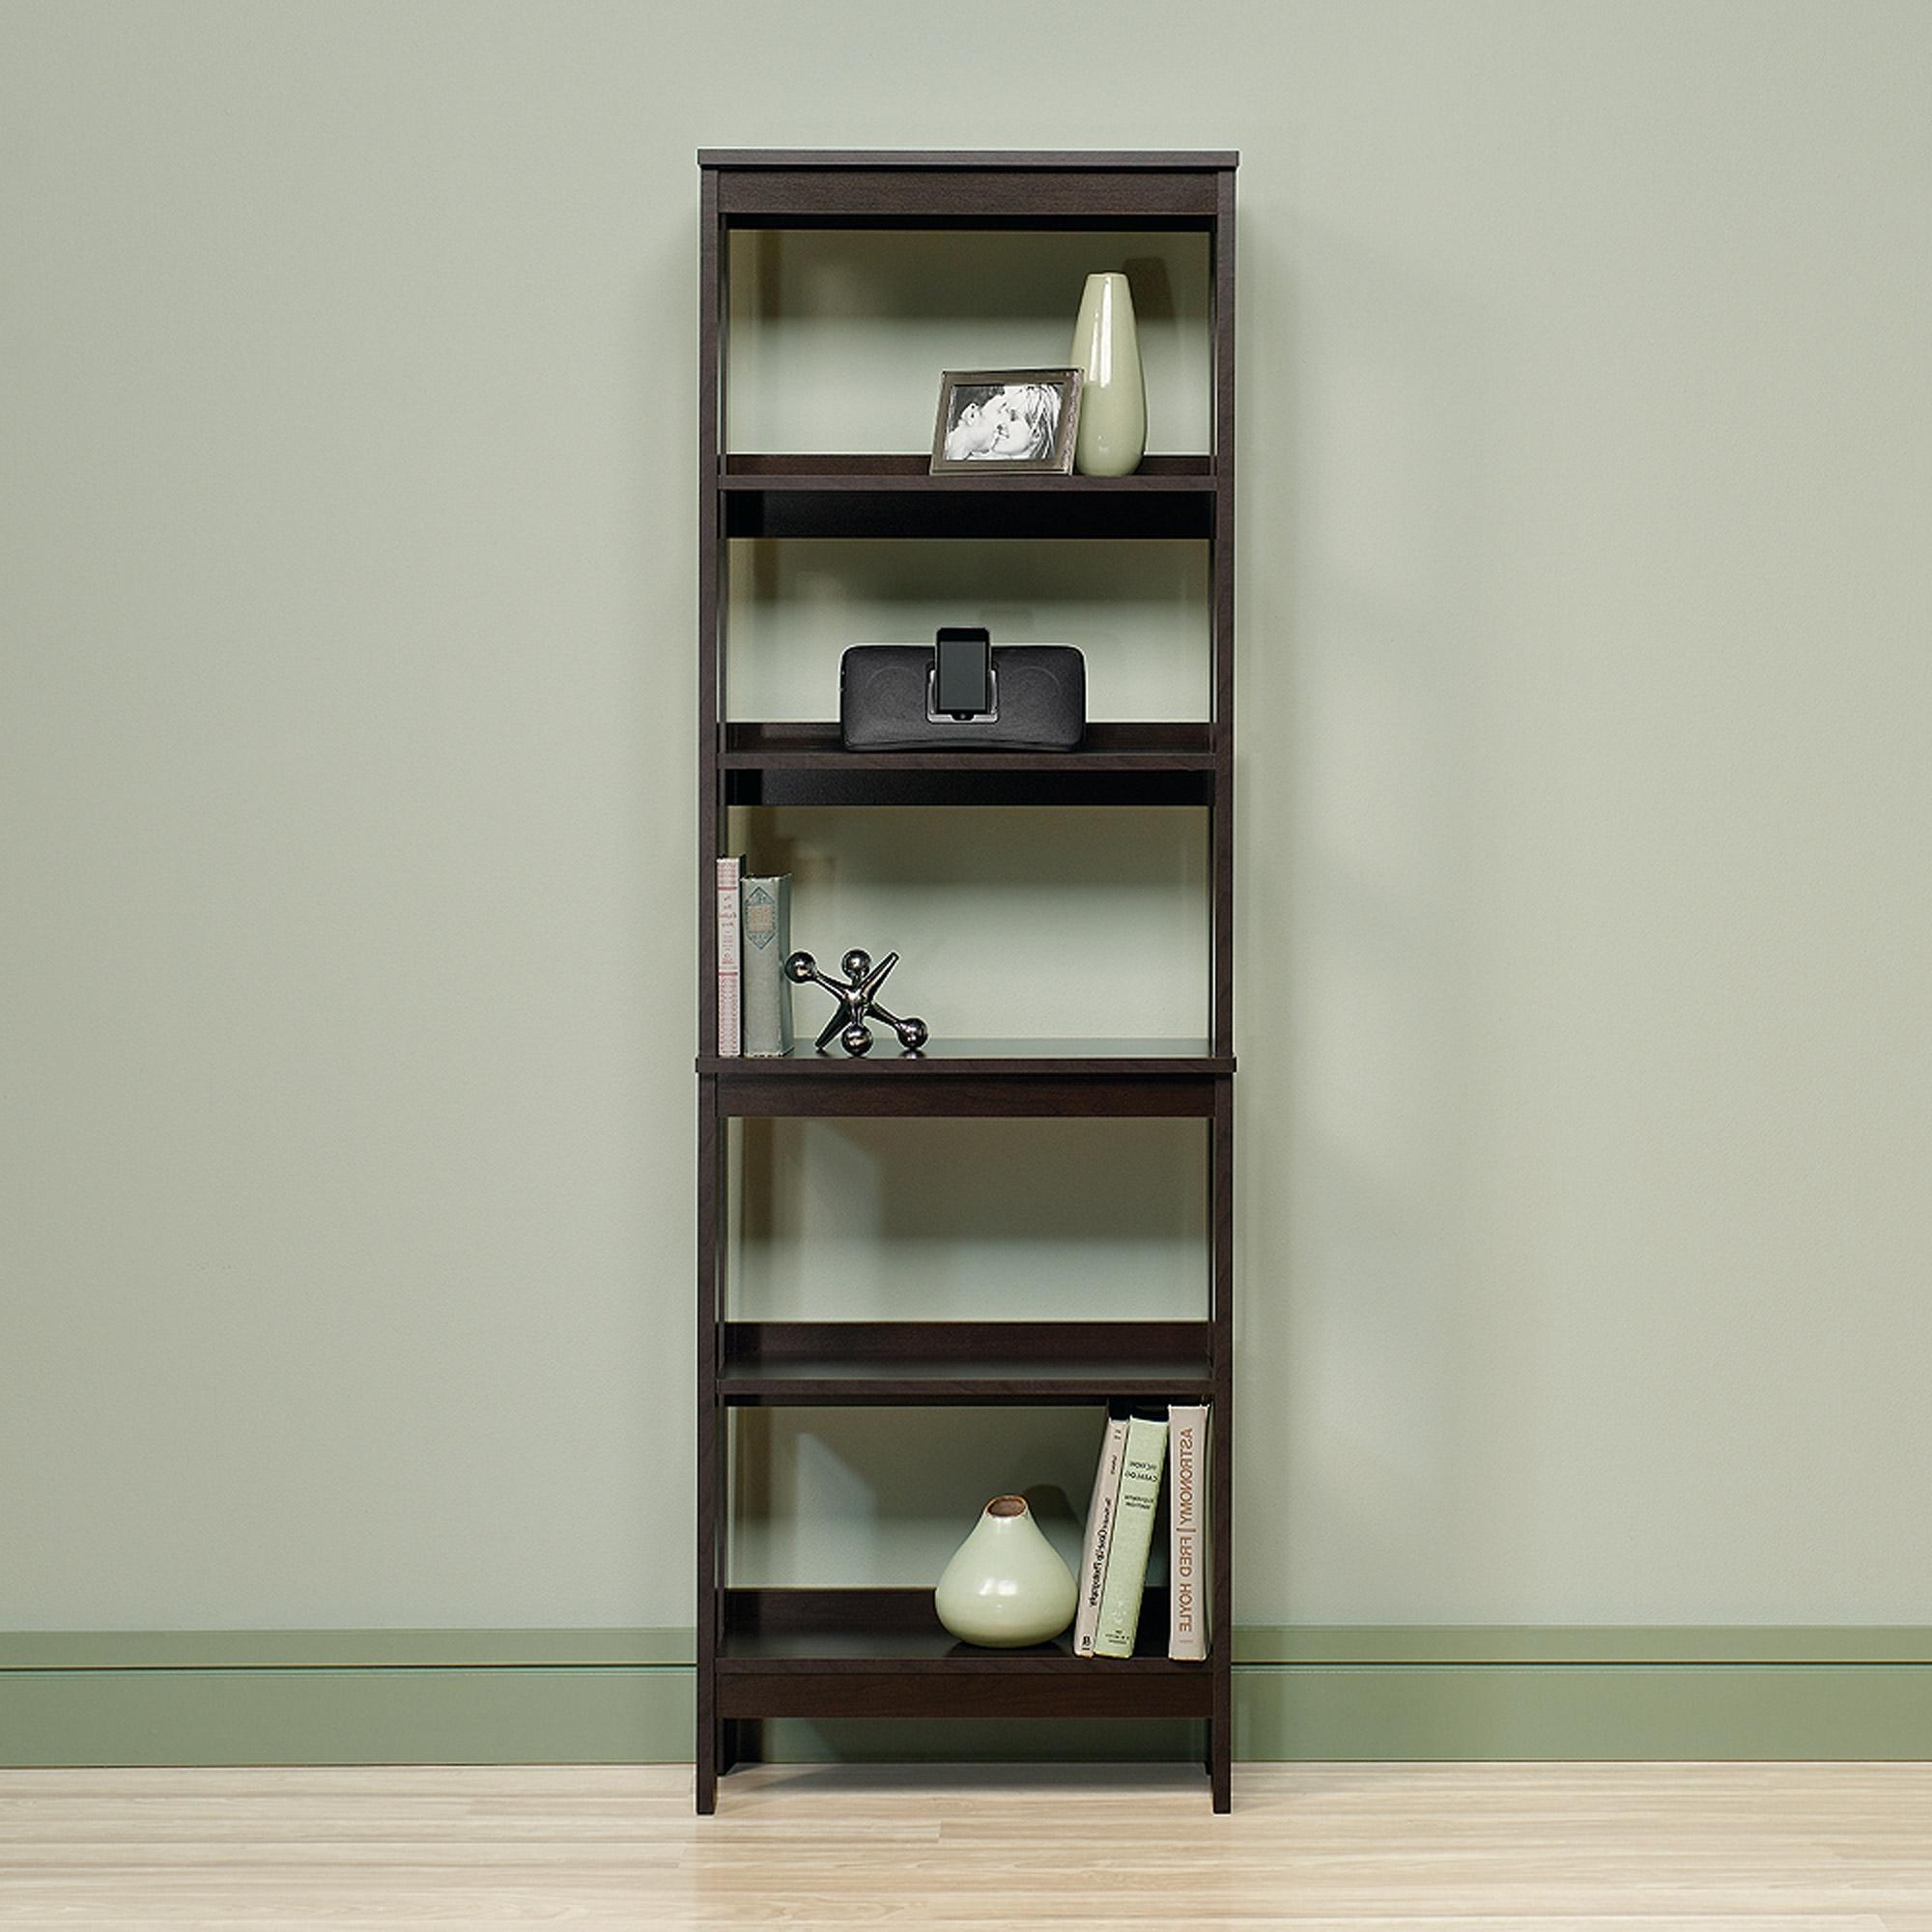 Sauder Beginnings 5 Shelf Bookcase, Cinnamon Cherry Finish In Widely Used Sauder Beginnings 3 Shelf Bookcases (View 12 of 15)